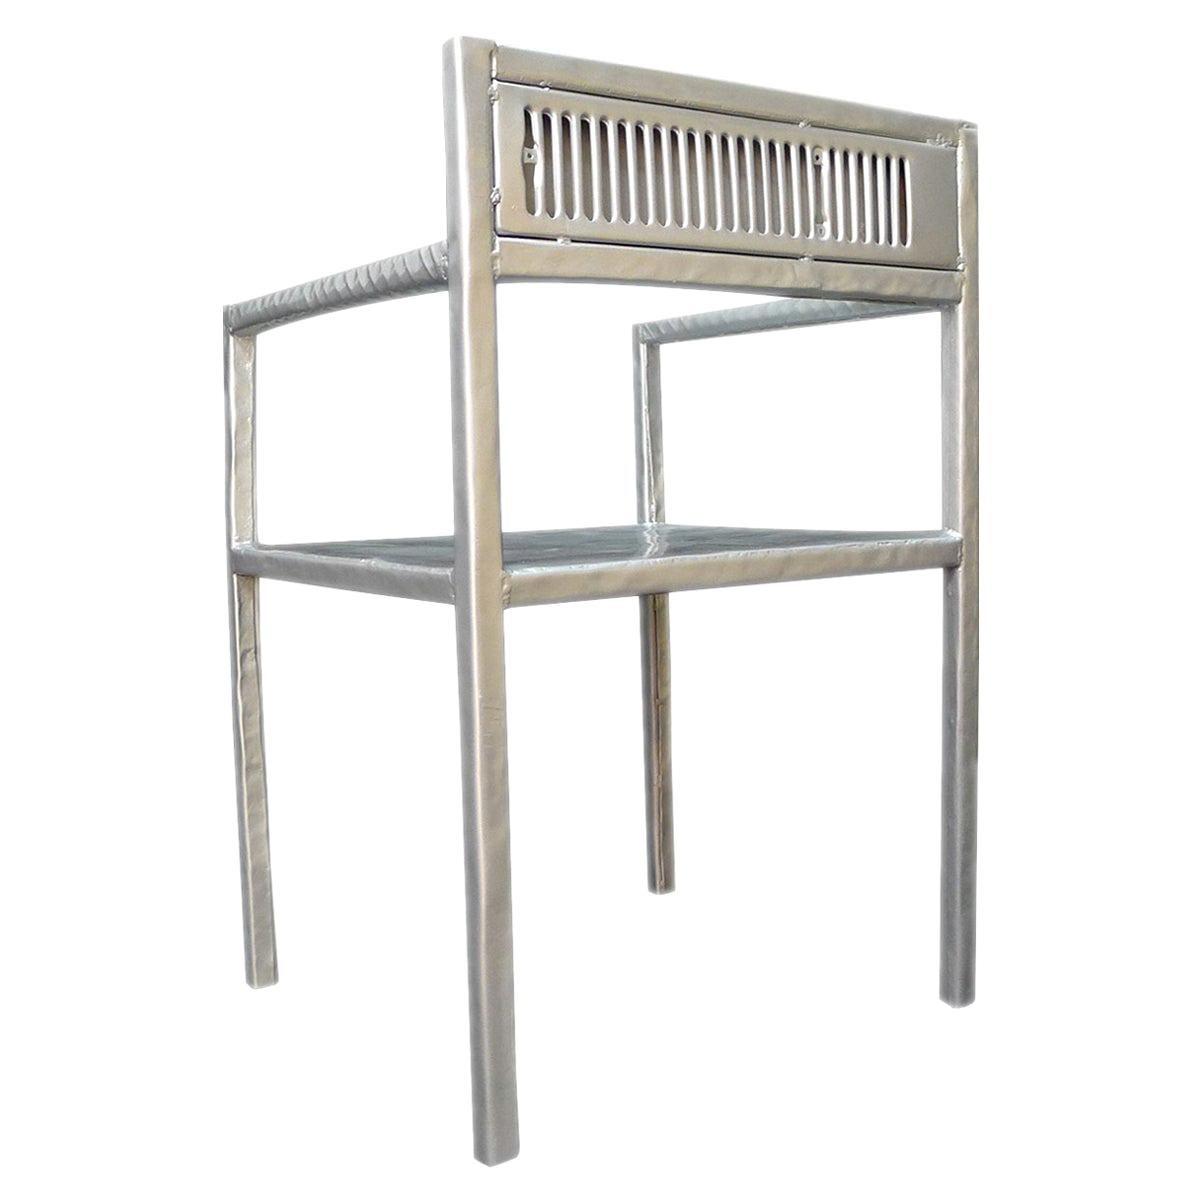 "Contemporary Reta Chair from ""Cars Never Die"" Collection by Alê Jordão, Brazil"